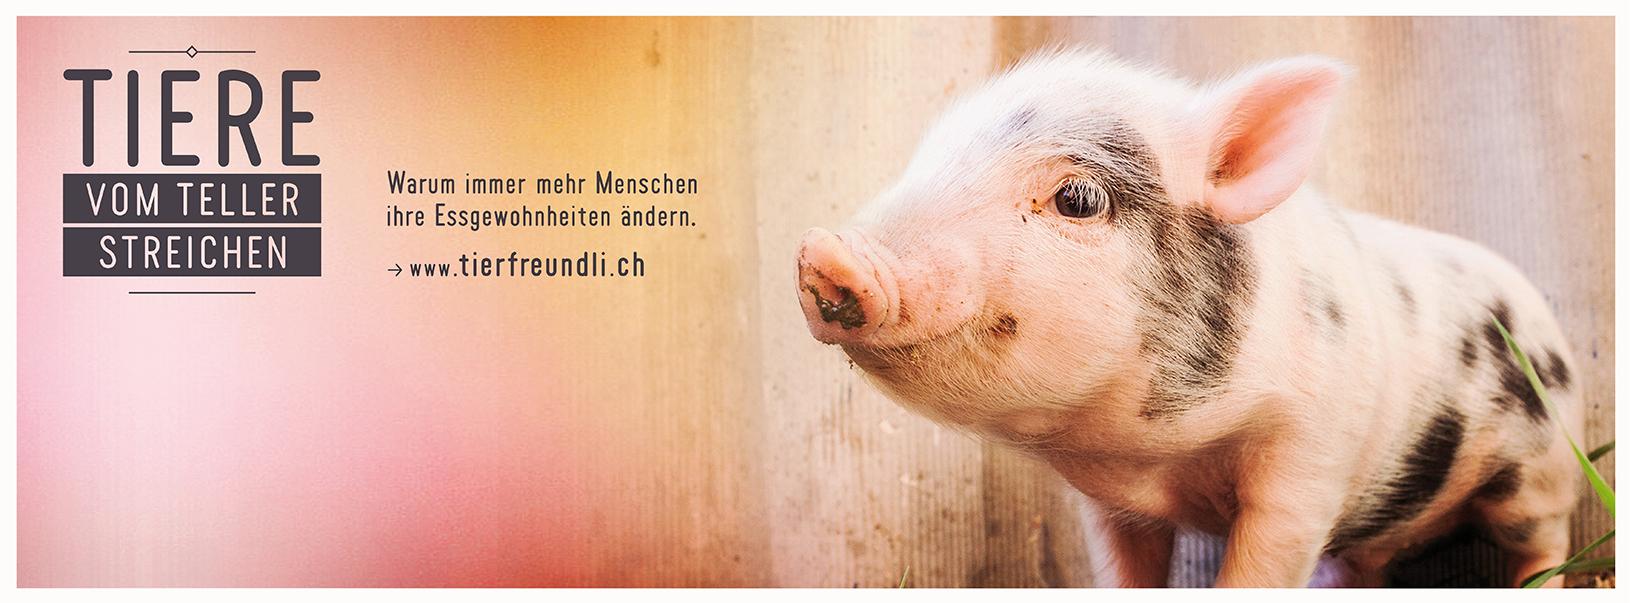 tierfreundli.ch 2017